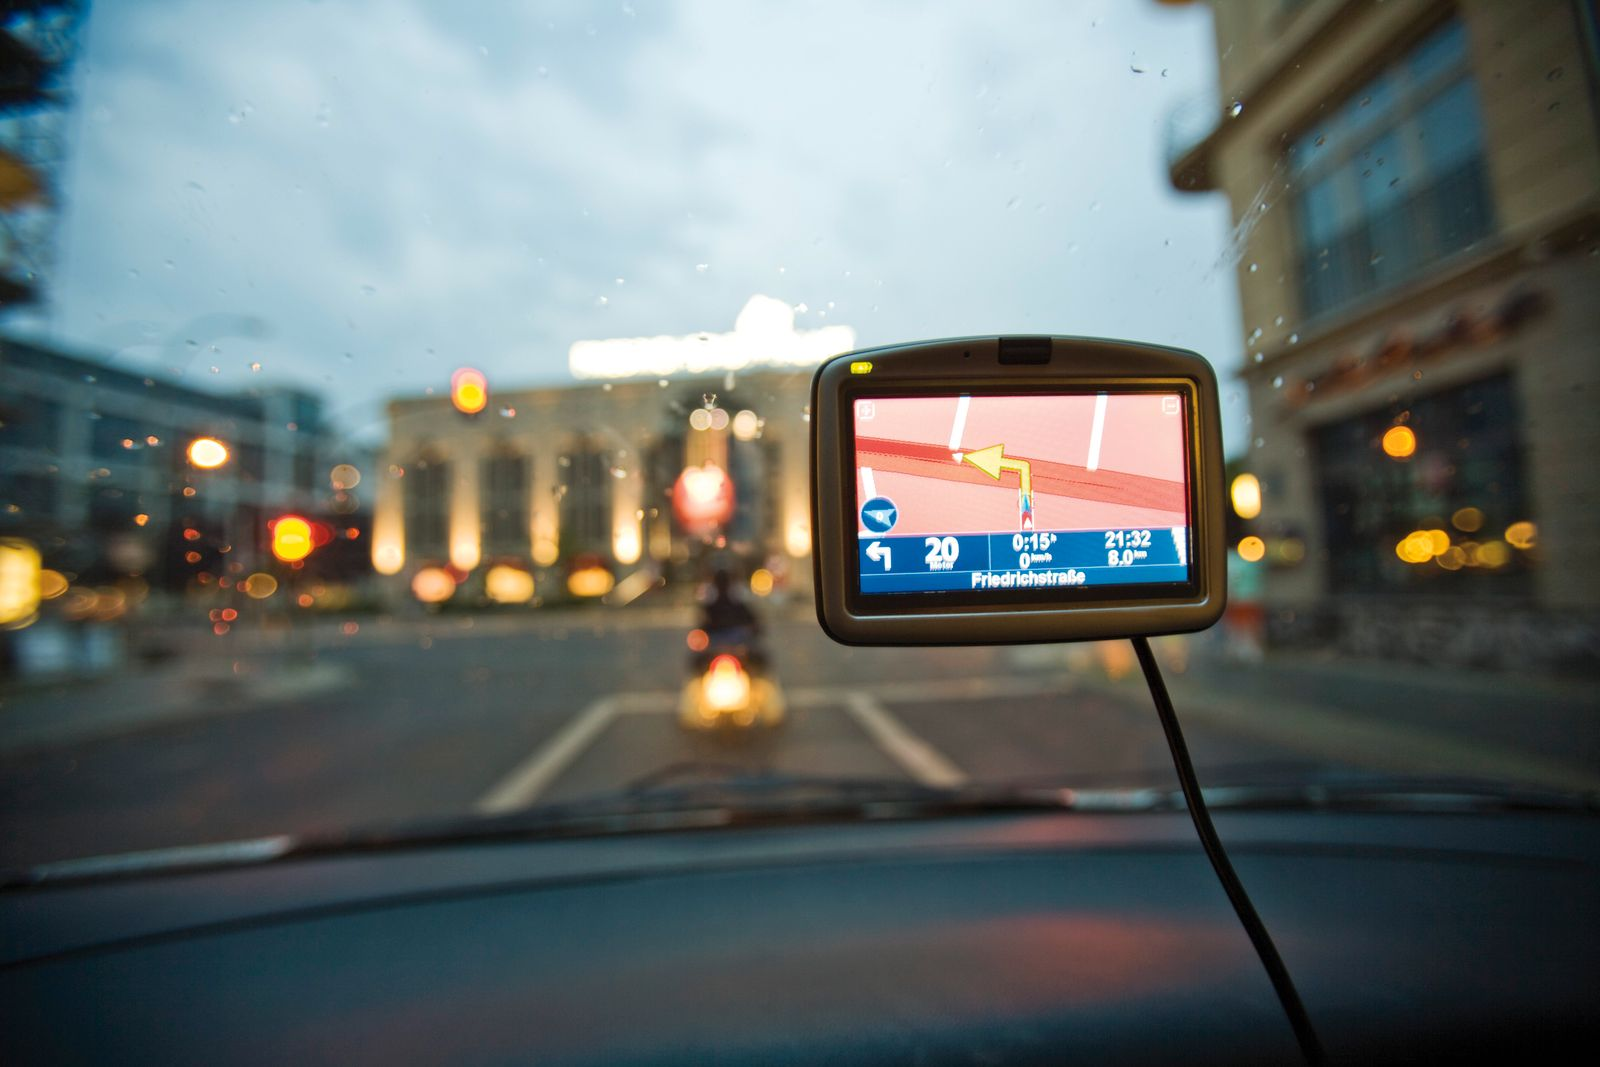 Germany, Berlin, Navigation system in car, Traffic seen through windscreen